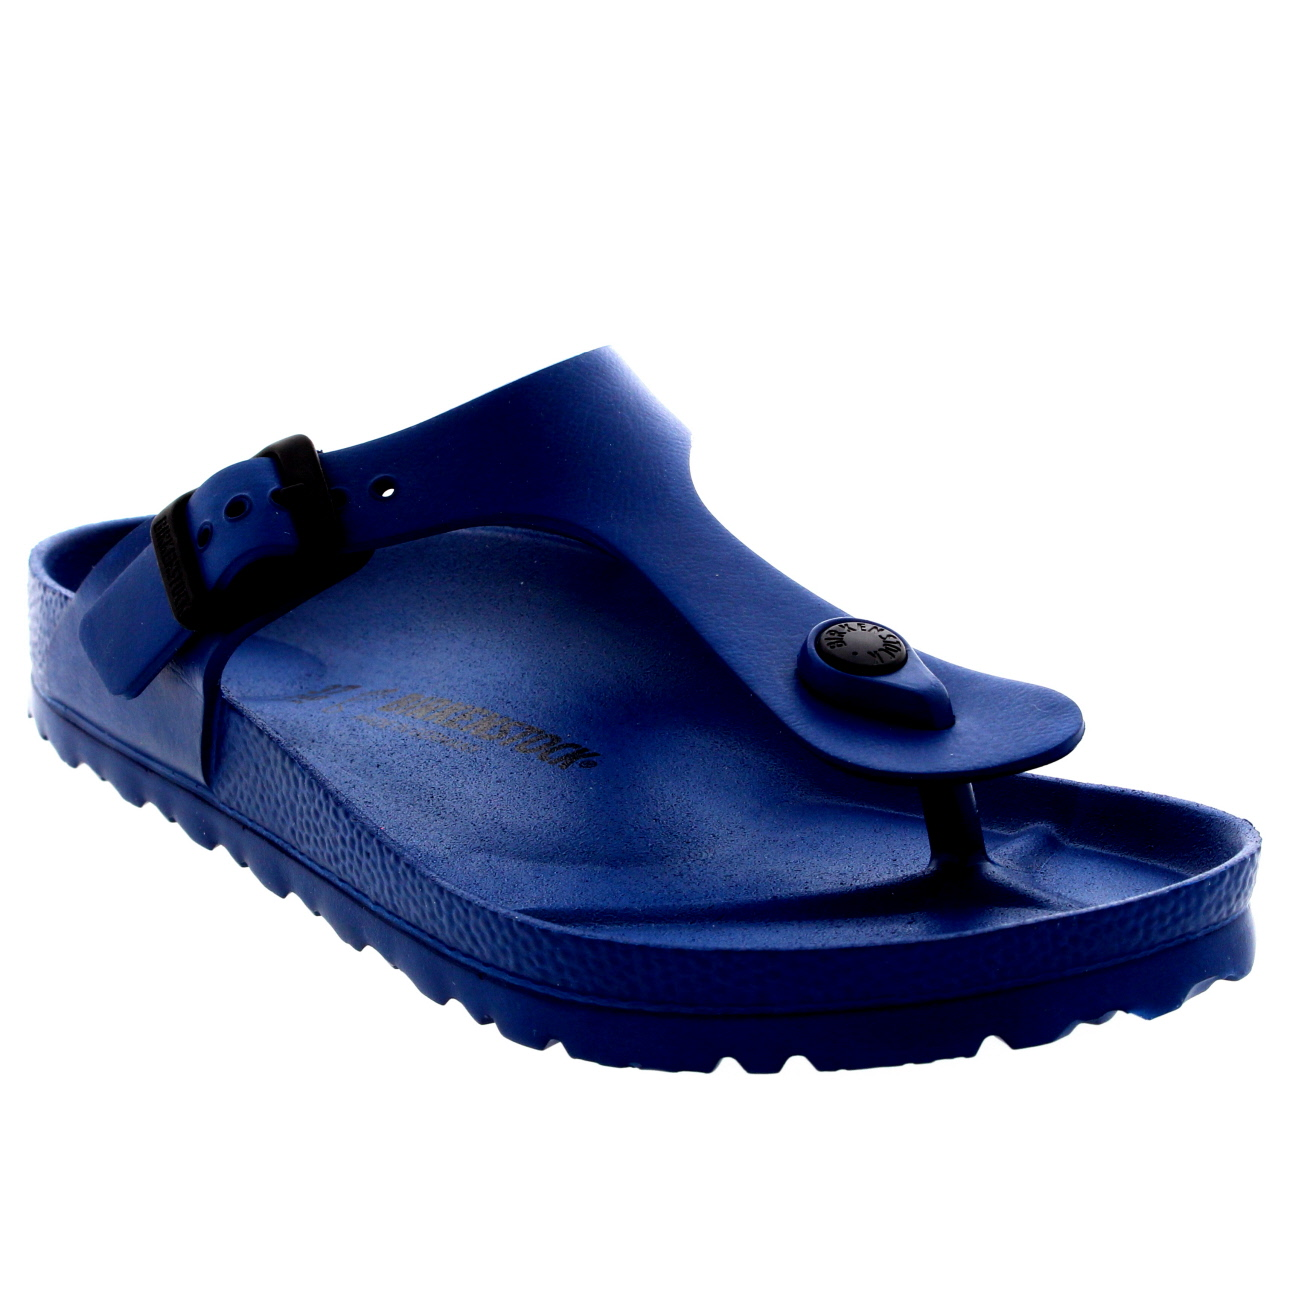 Unisex-Adults-Birkenstock-Gizeh-Summer-EVA-Toe-Post-Beach-Flat-Sandals-All-Sizes thumbnail 23